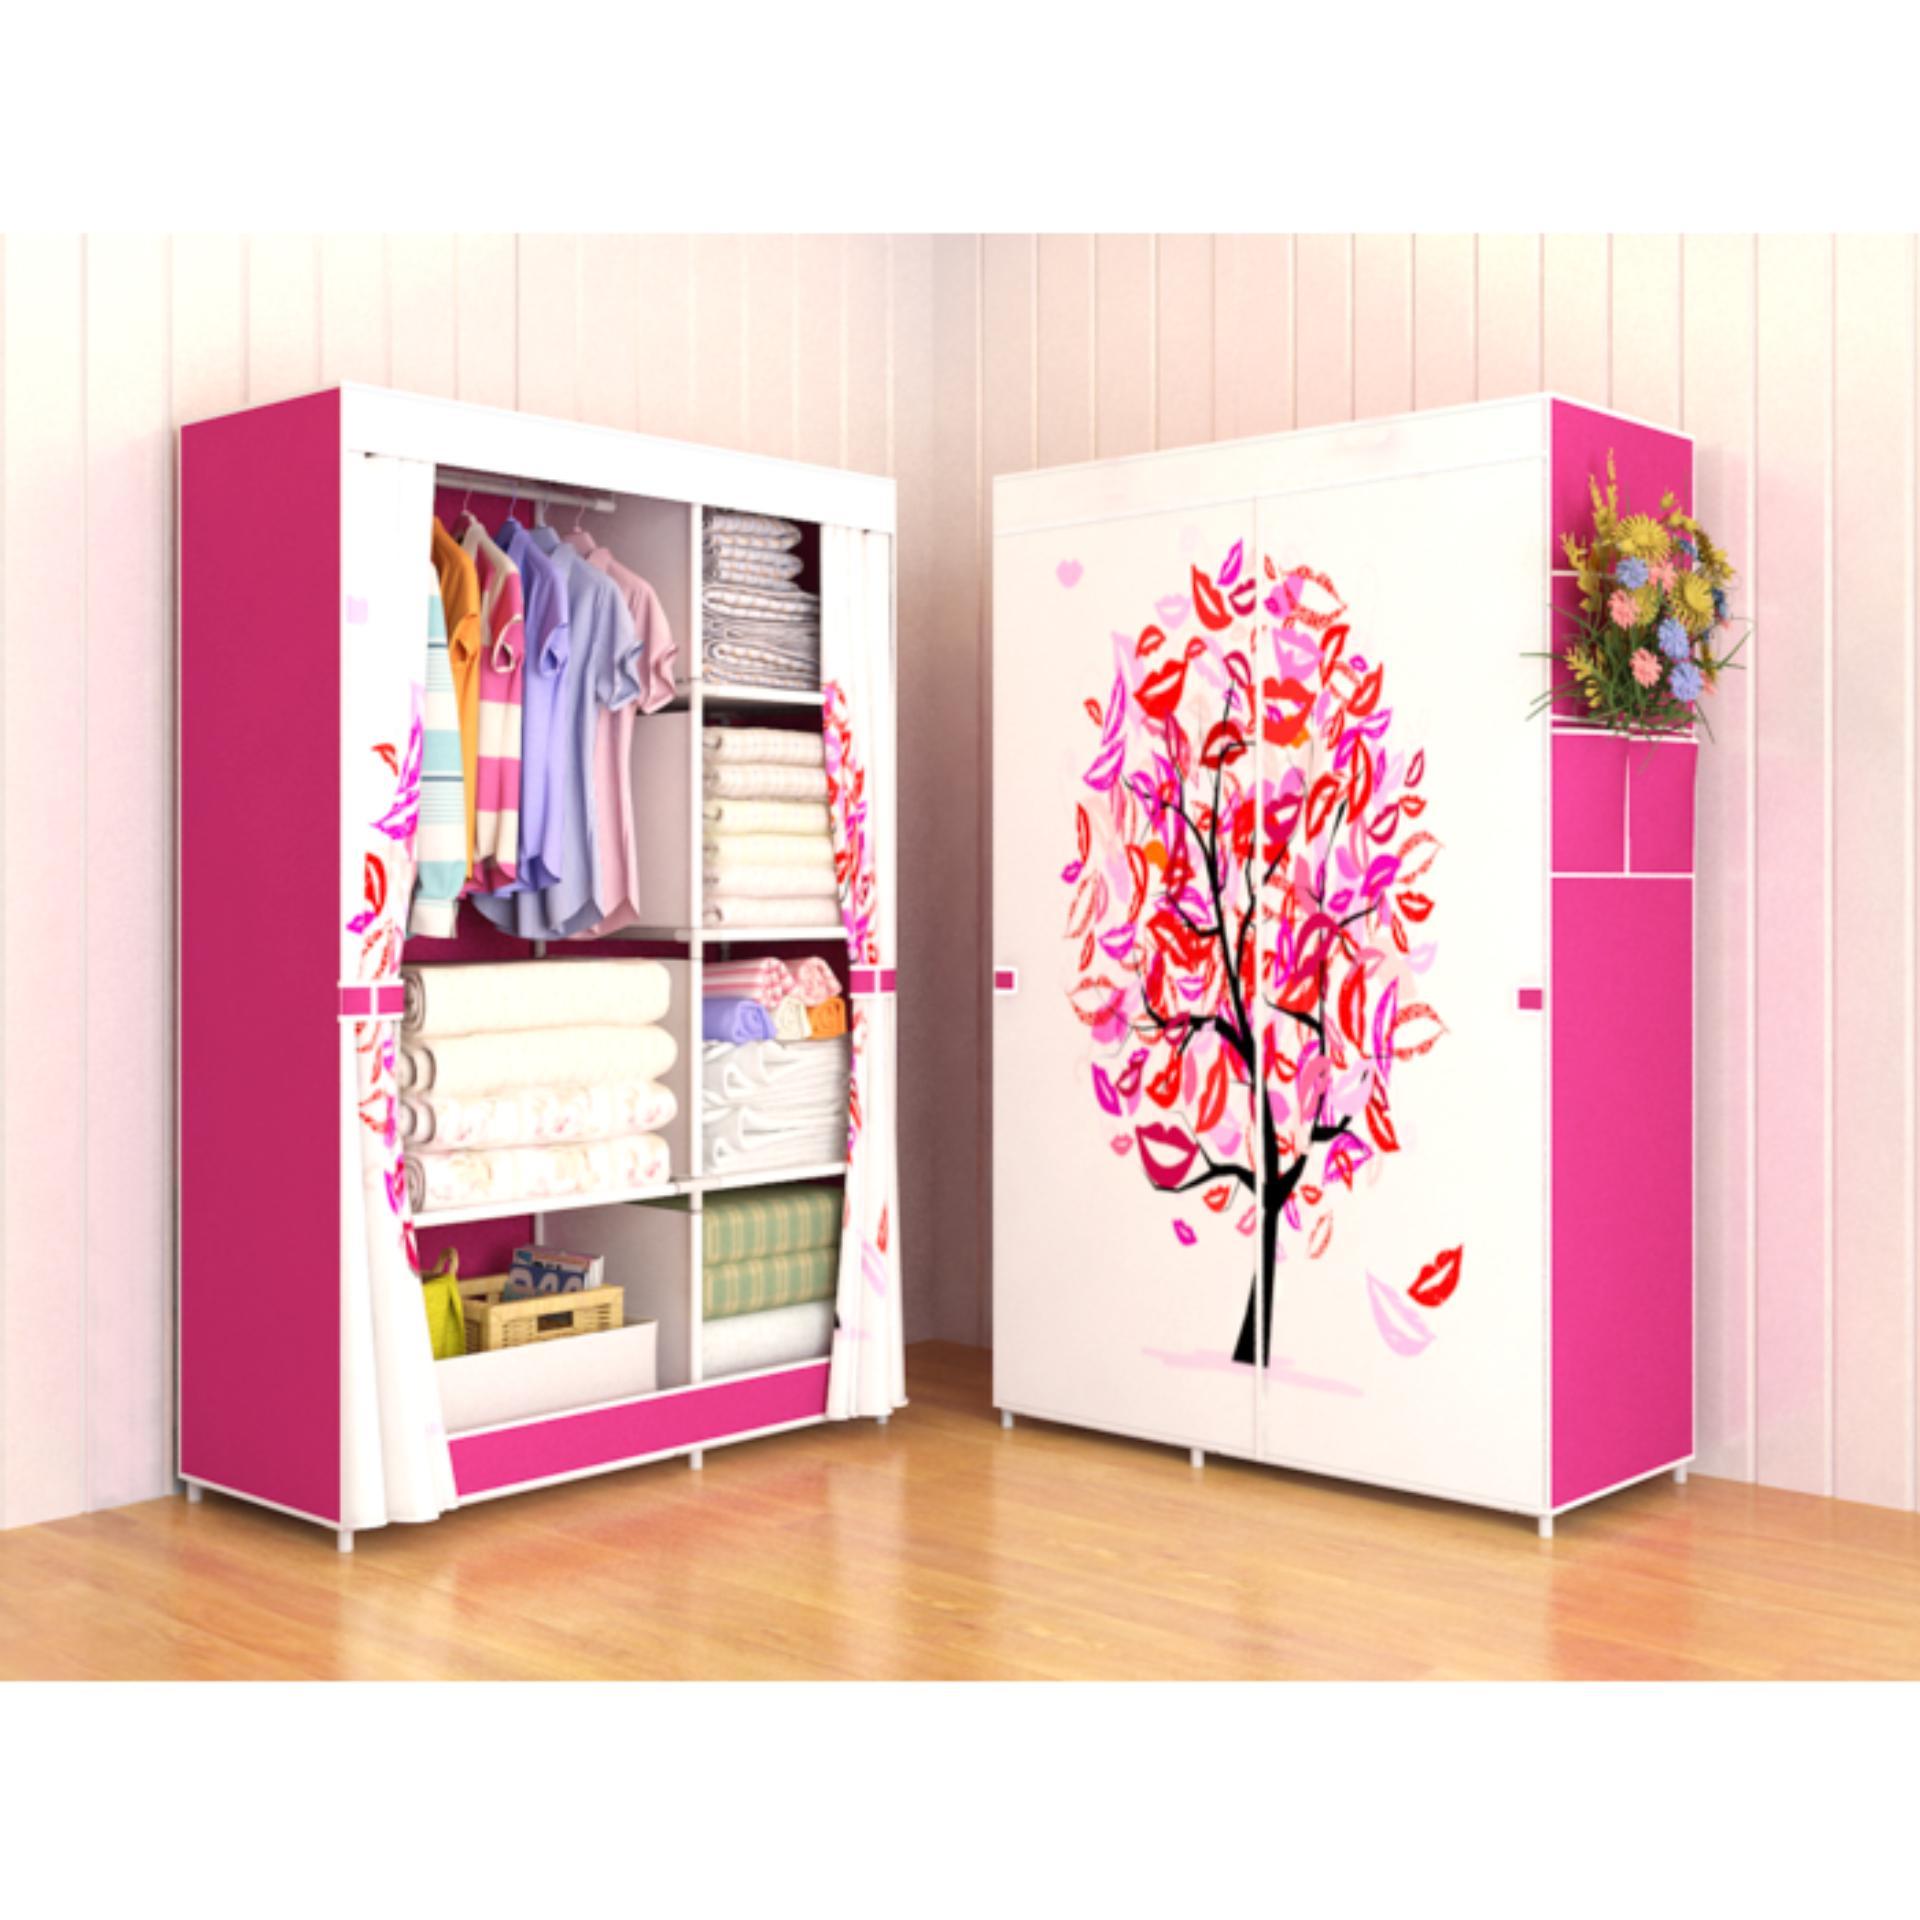 Allunique Lemari Pakaian Portable 2 Layer Pink Tree Lazada Indonesia